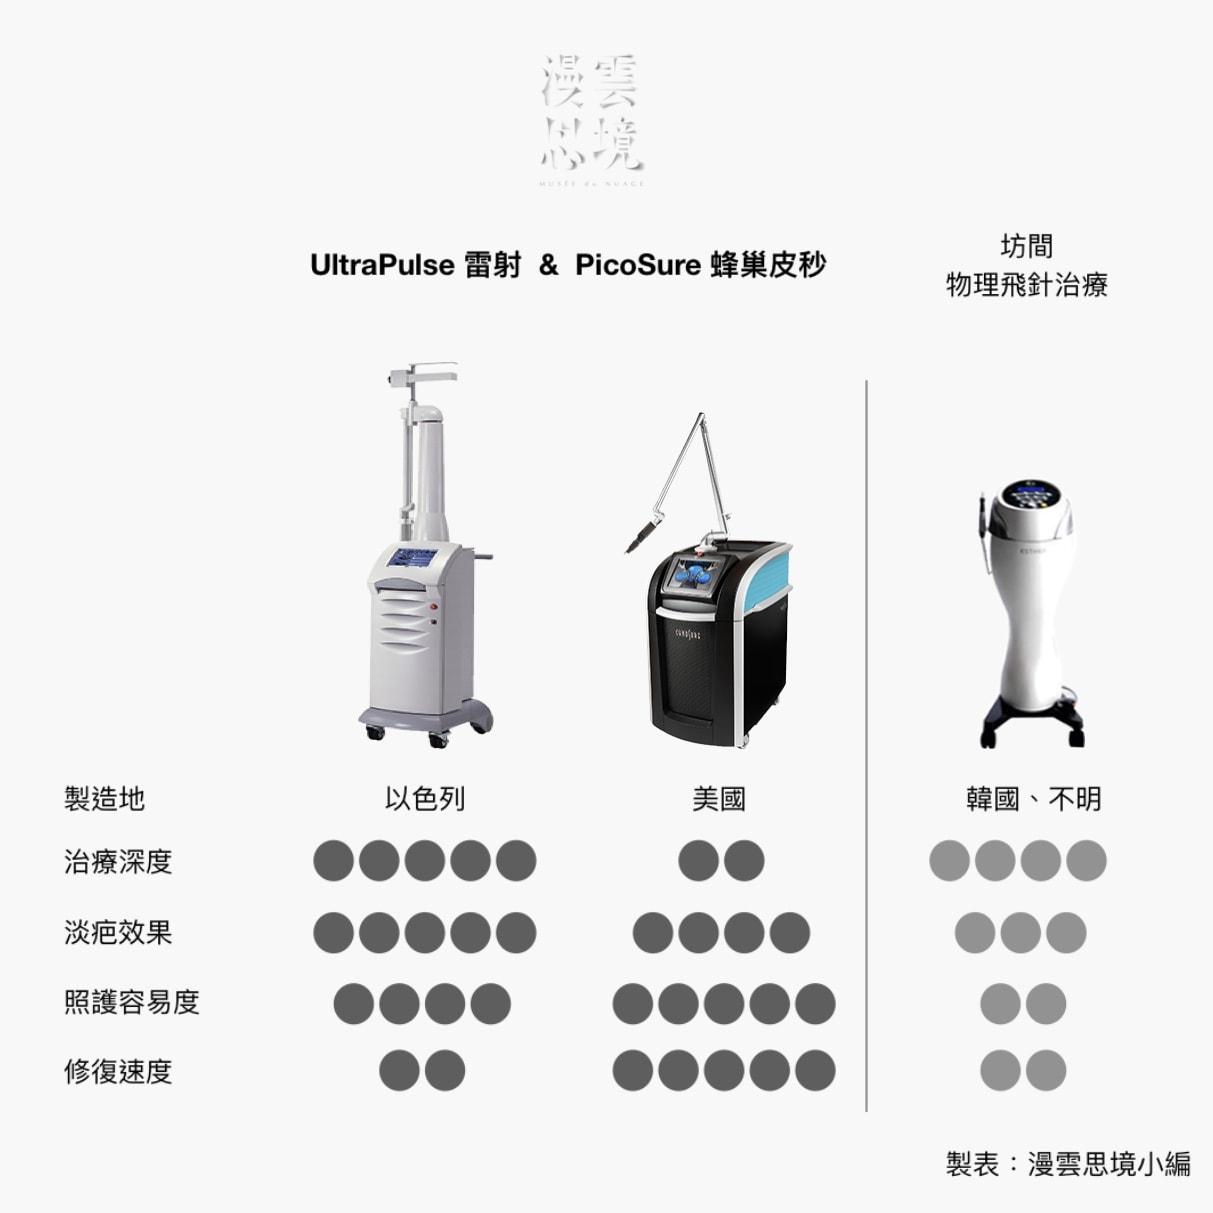 醫學美容 | UltraPulse x PicoSure蜂巢皮秒 v.s 傳統飛針 2